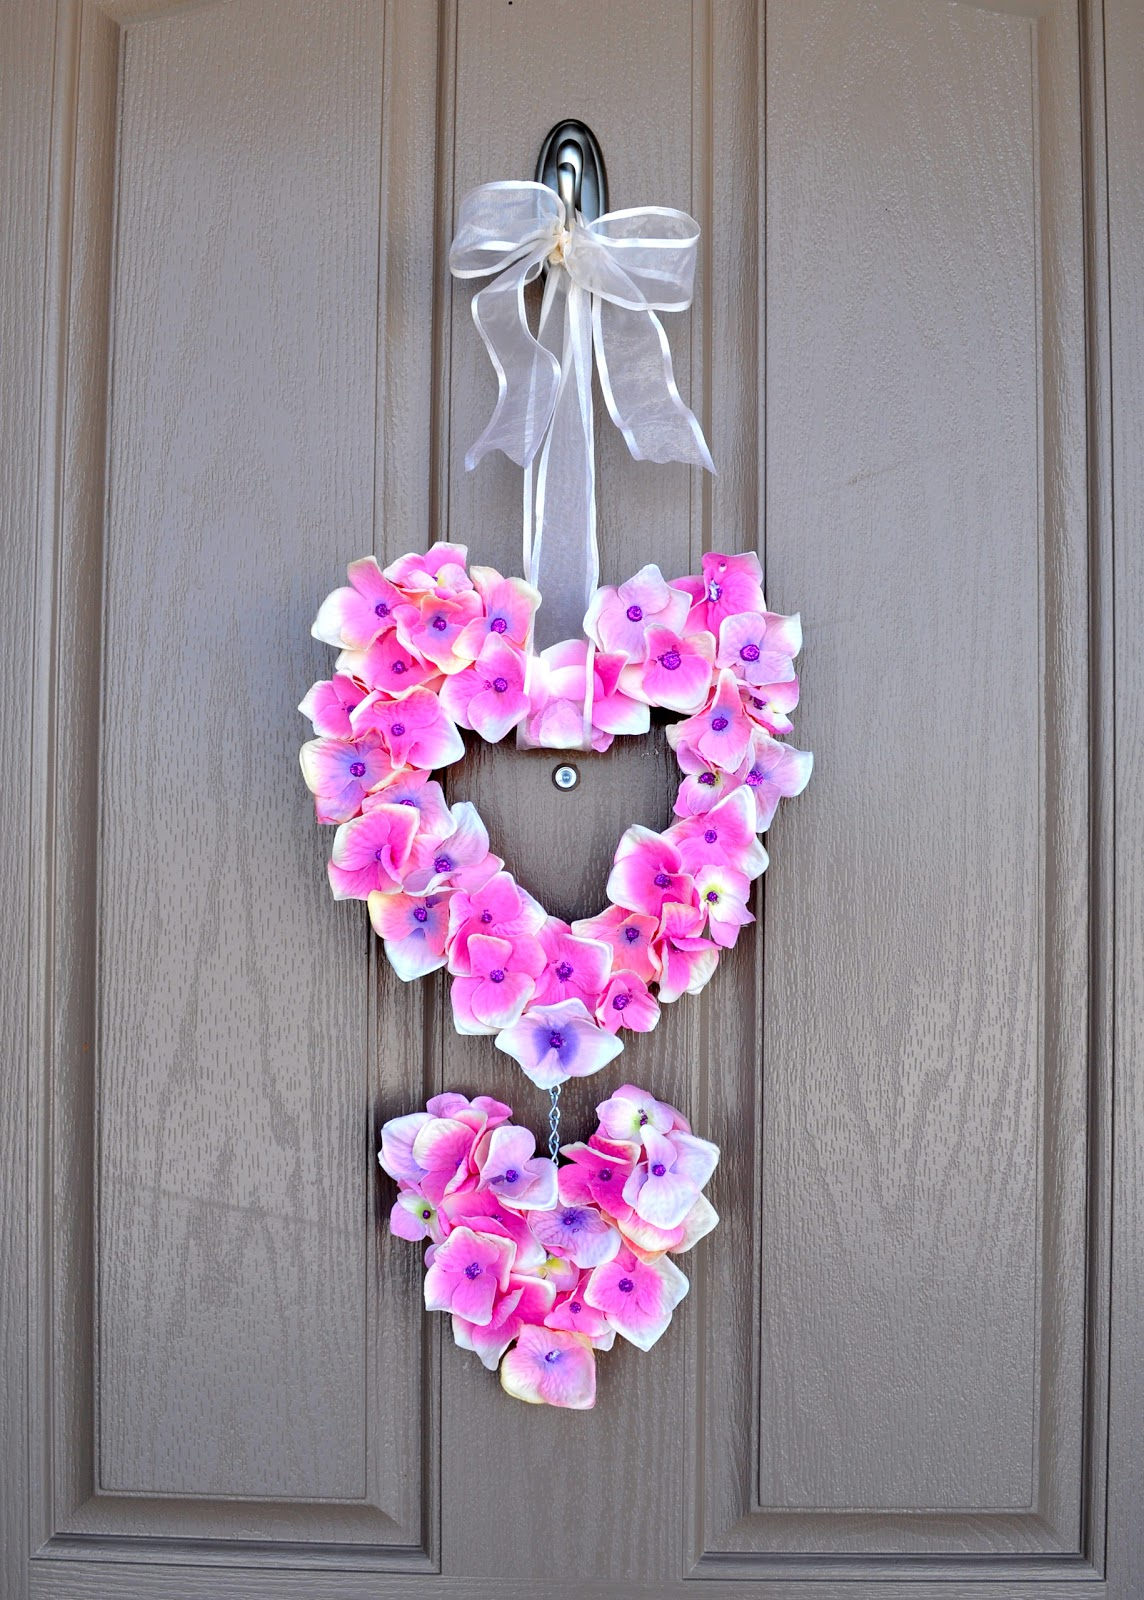 Sassy sanctuary valentines wreath door hanging valentines wreath door hanging rubansaba